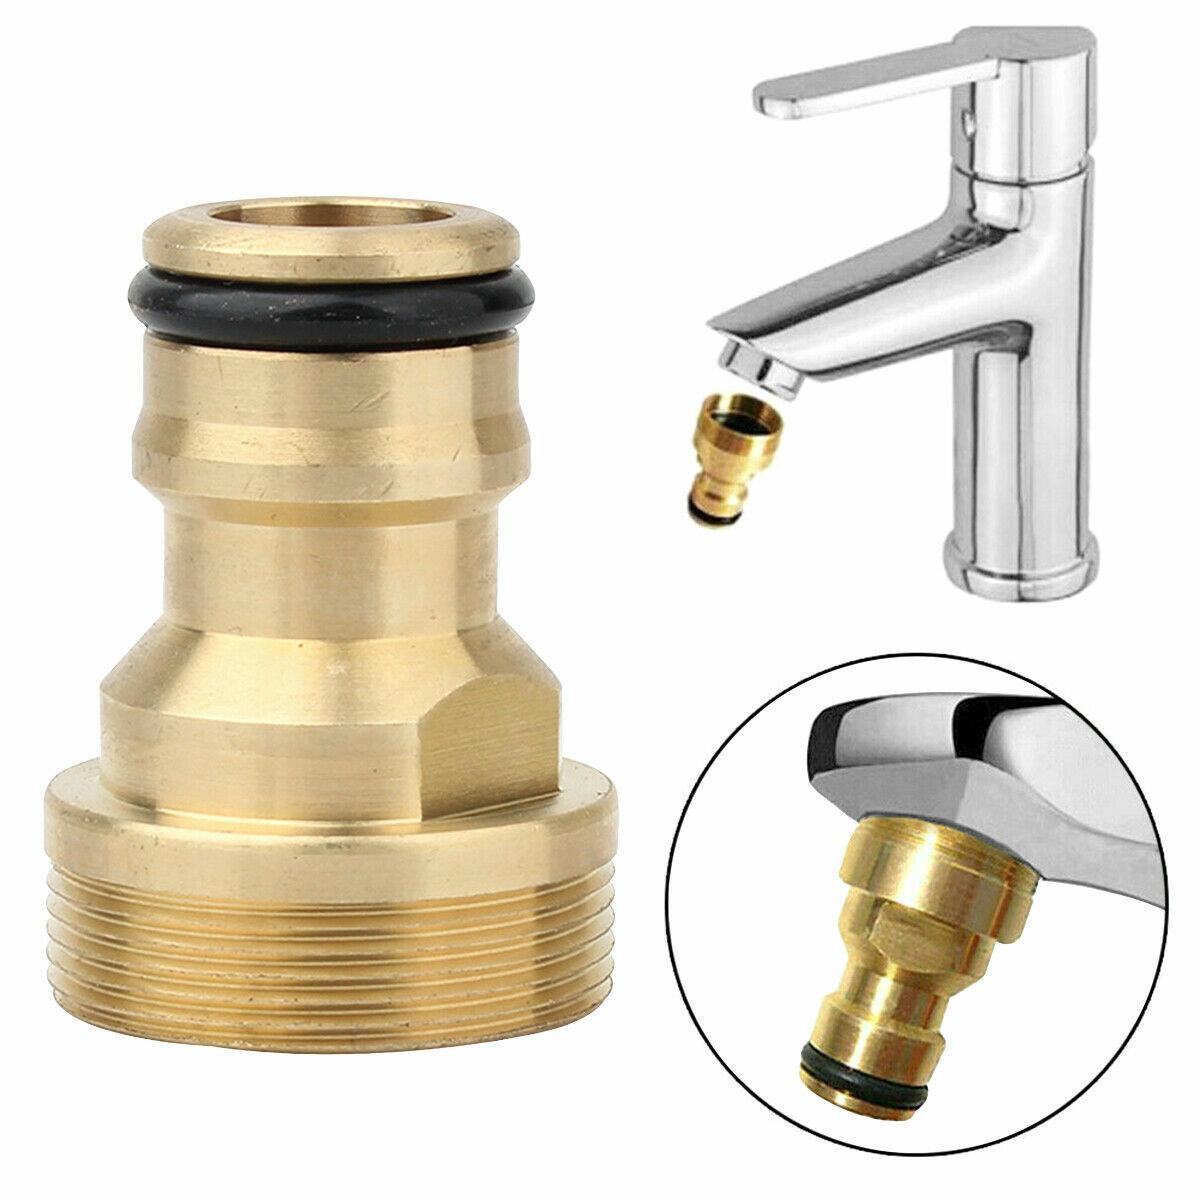 Universal Kitchen Tap Thread Connector Mixer Garden Hose Adaptor Faucet Fitting